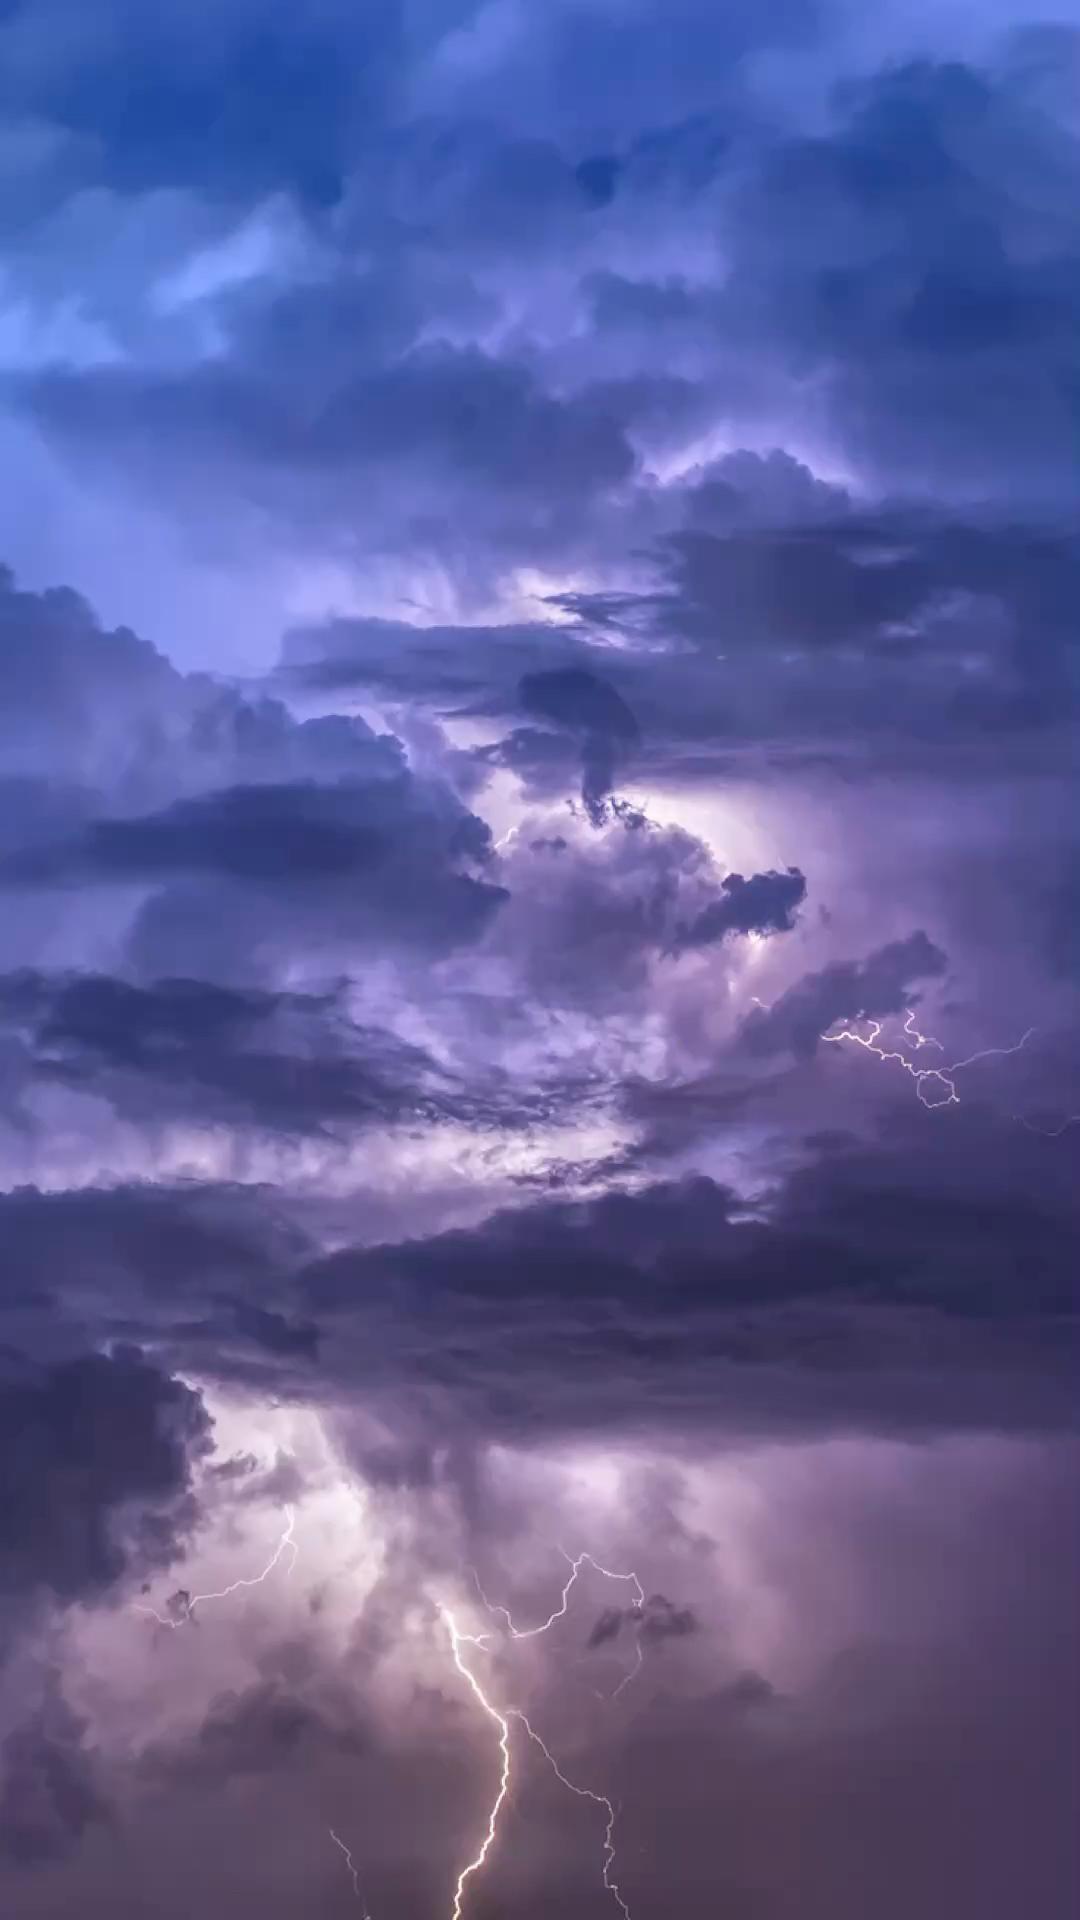 Clouds Lightning Ocean Moon Wallpaper 1001